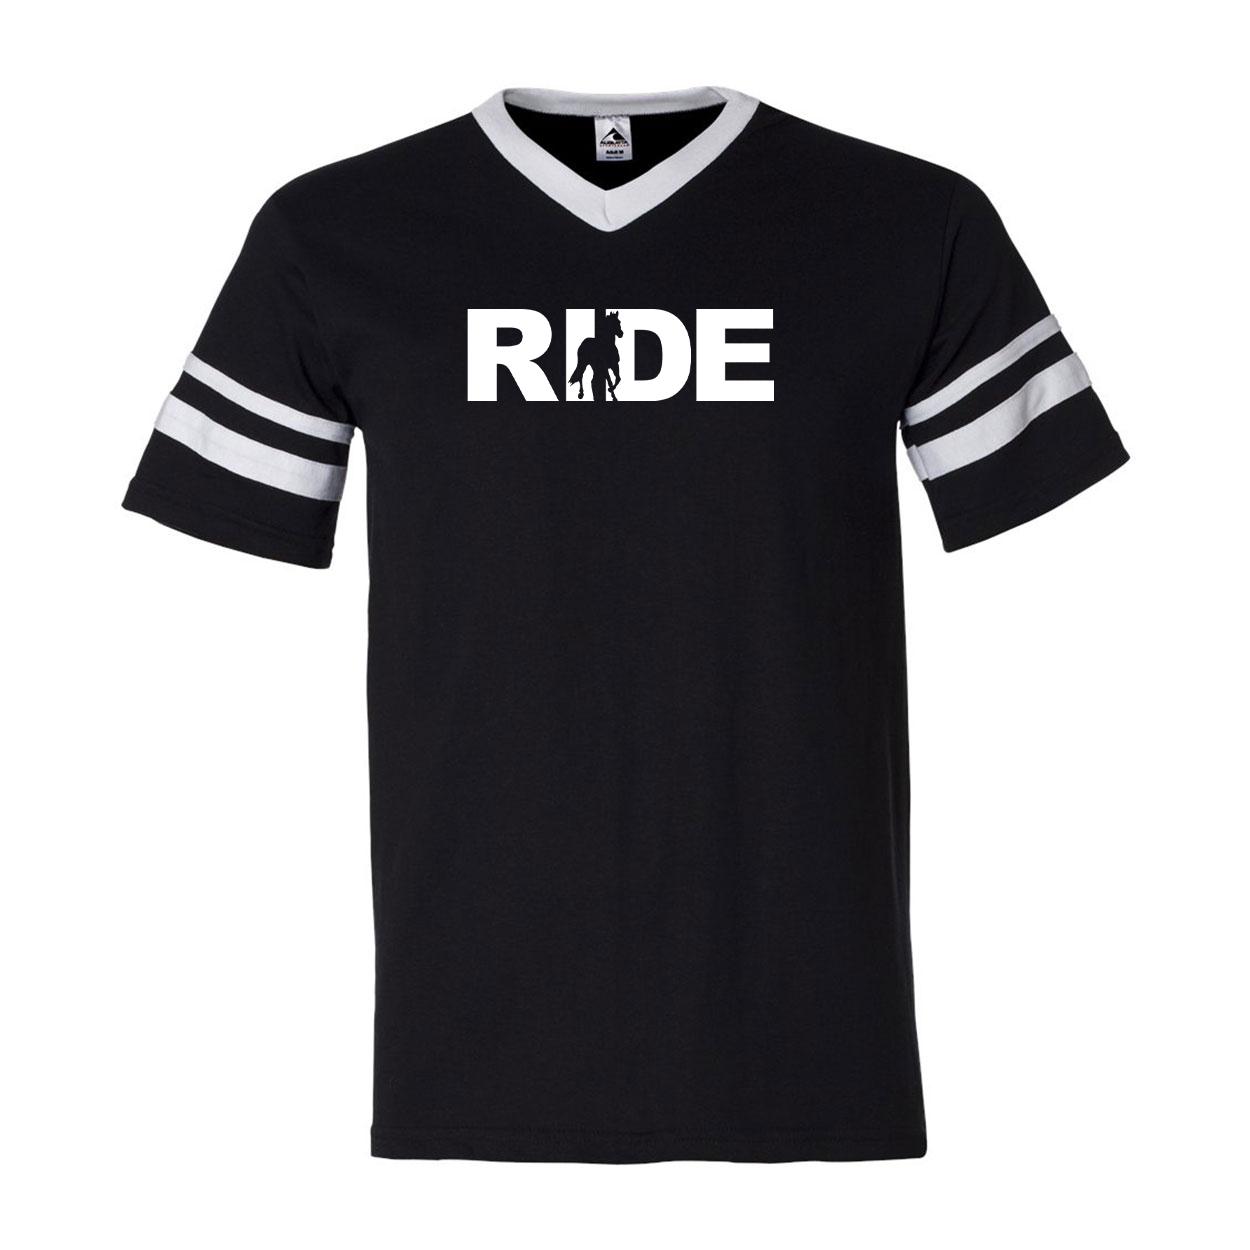 Ride Horse Logo Classic Premium Striped Jersey T-Shirt Black/White (White Logo)